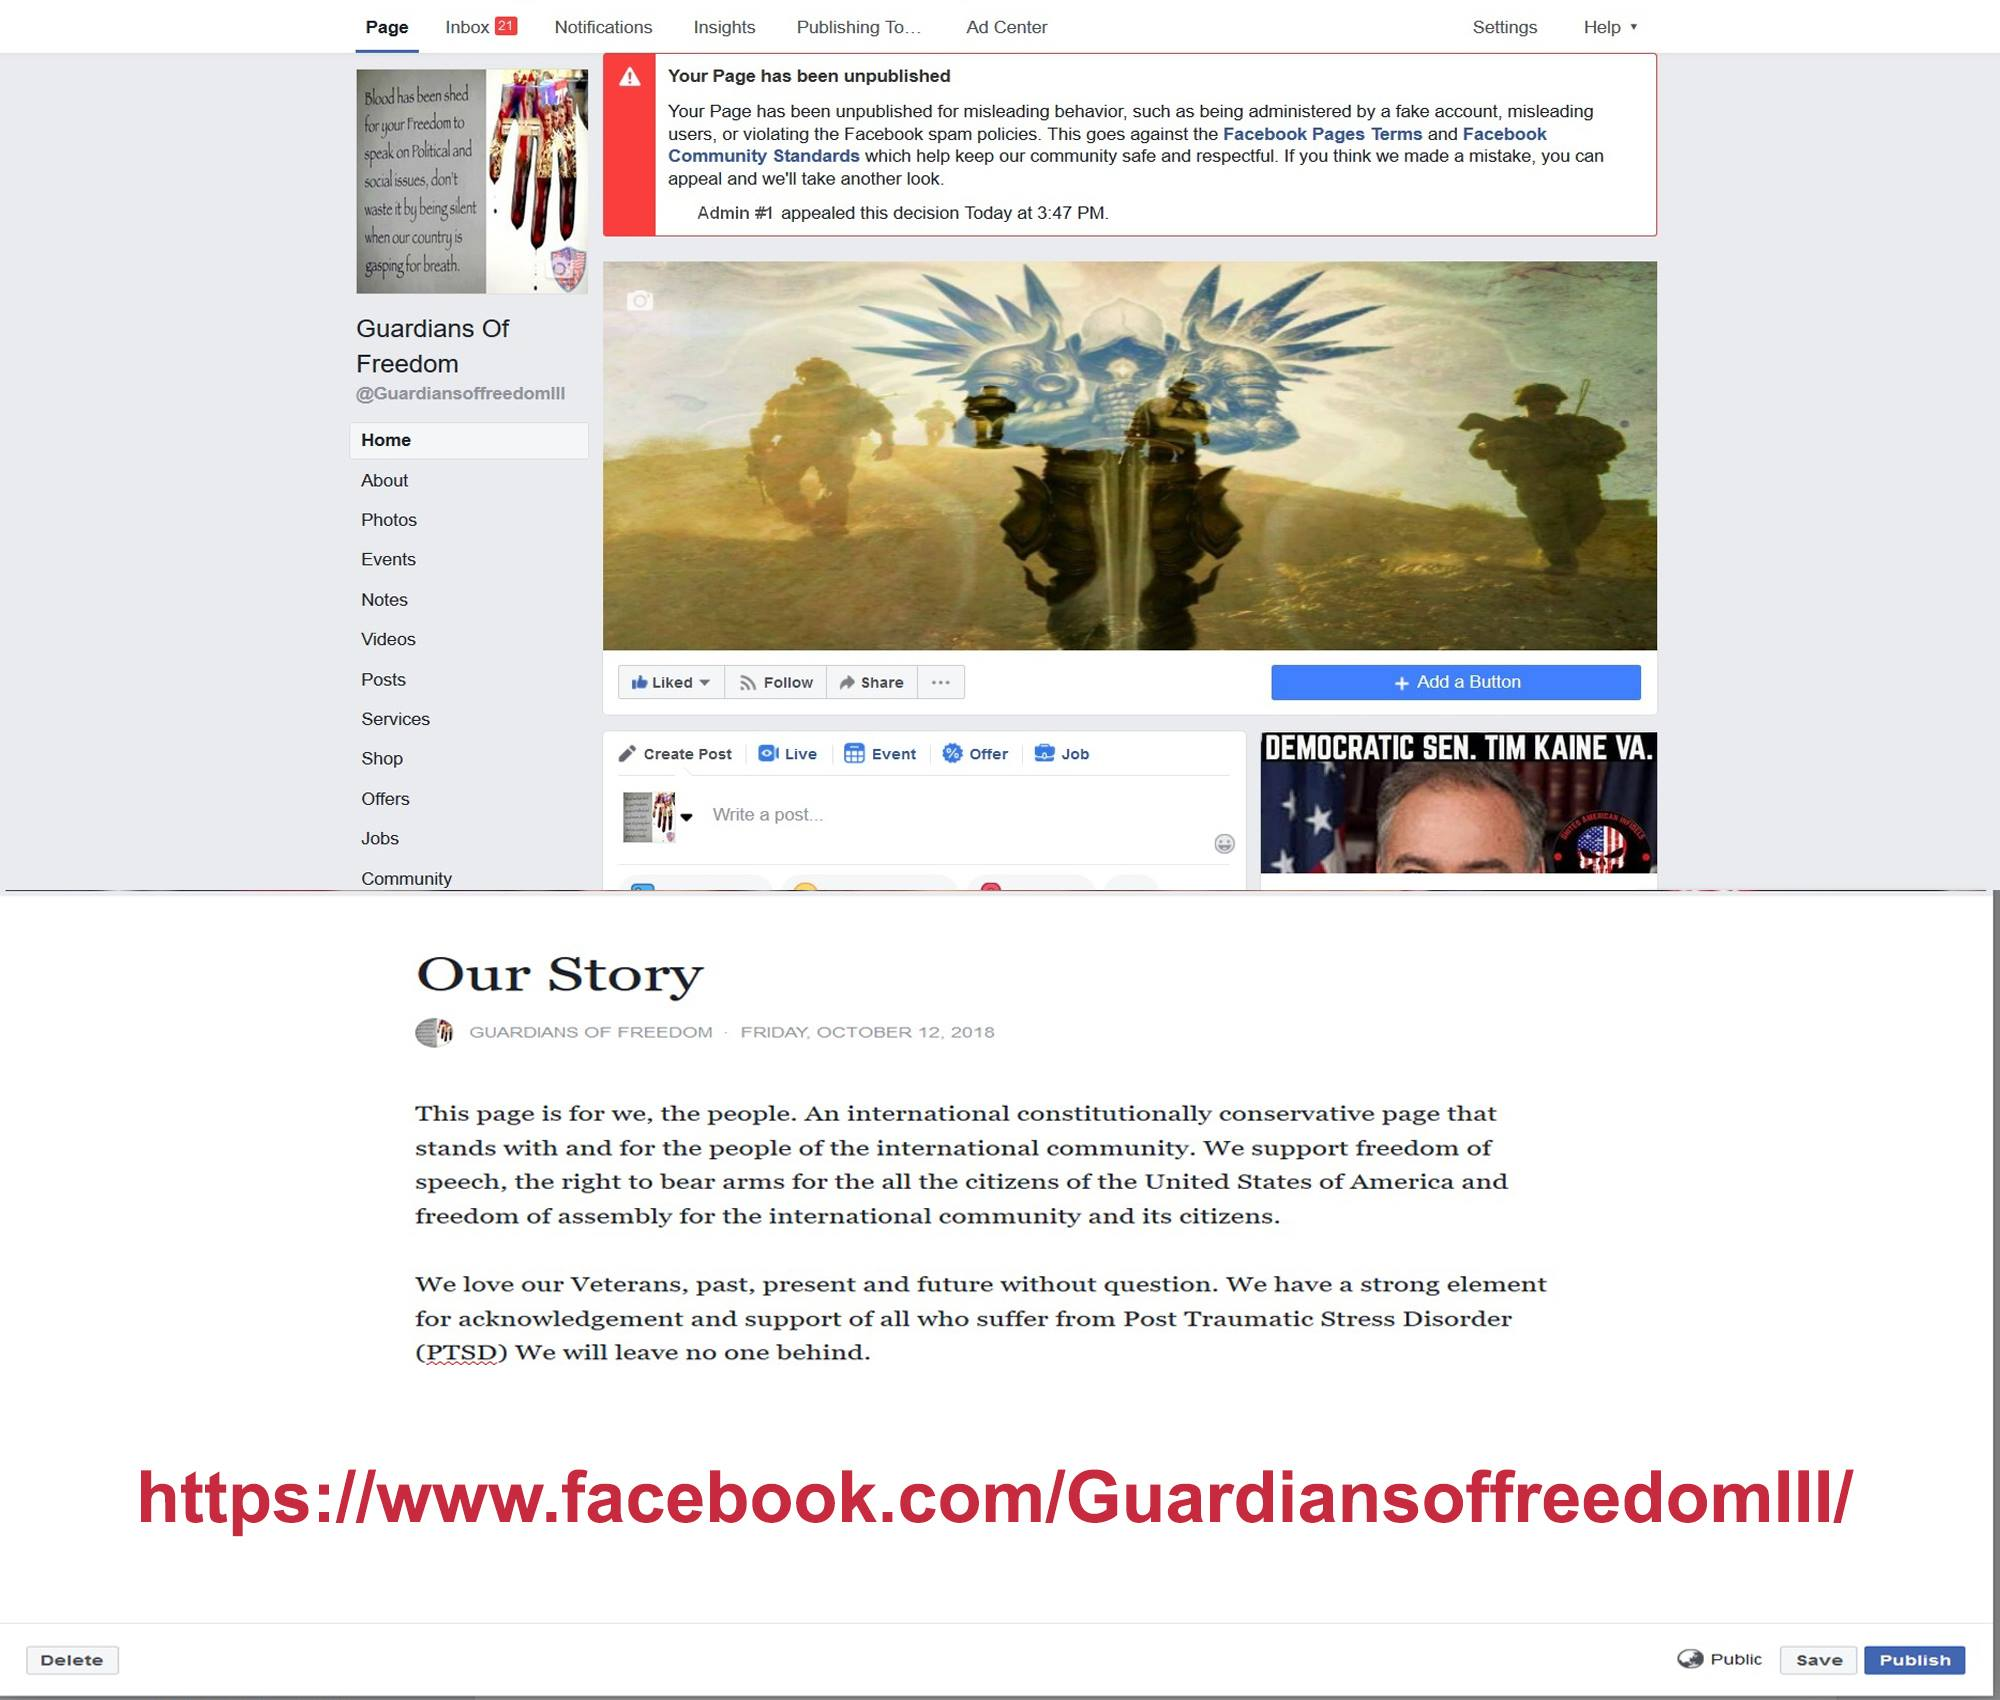 Facebook PTSD